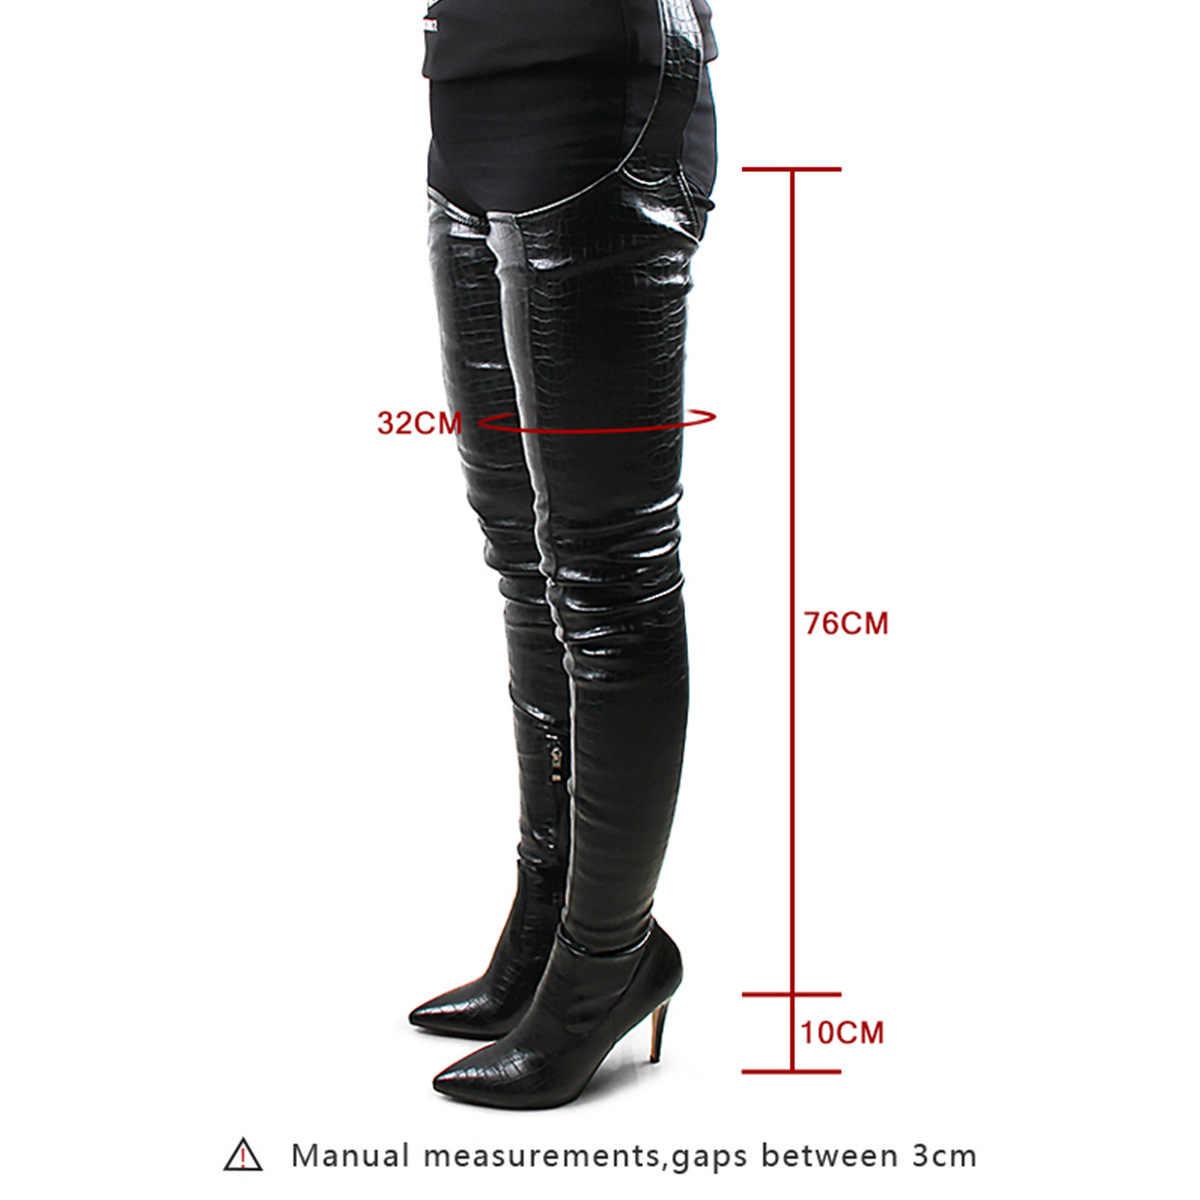 Prova Perfetto Euramerican สไตล์ผู้หญิงสีดำเซ็กซี่รองเท้าเข่ารองเท้าส้นสูงชี้ Toe แฟชั่น Rihanna รองเท้าเซ็กซี่